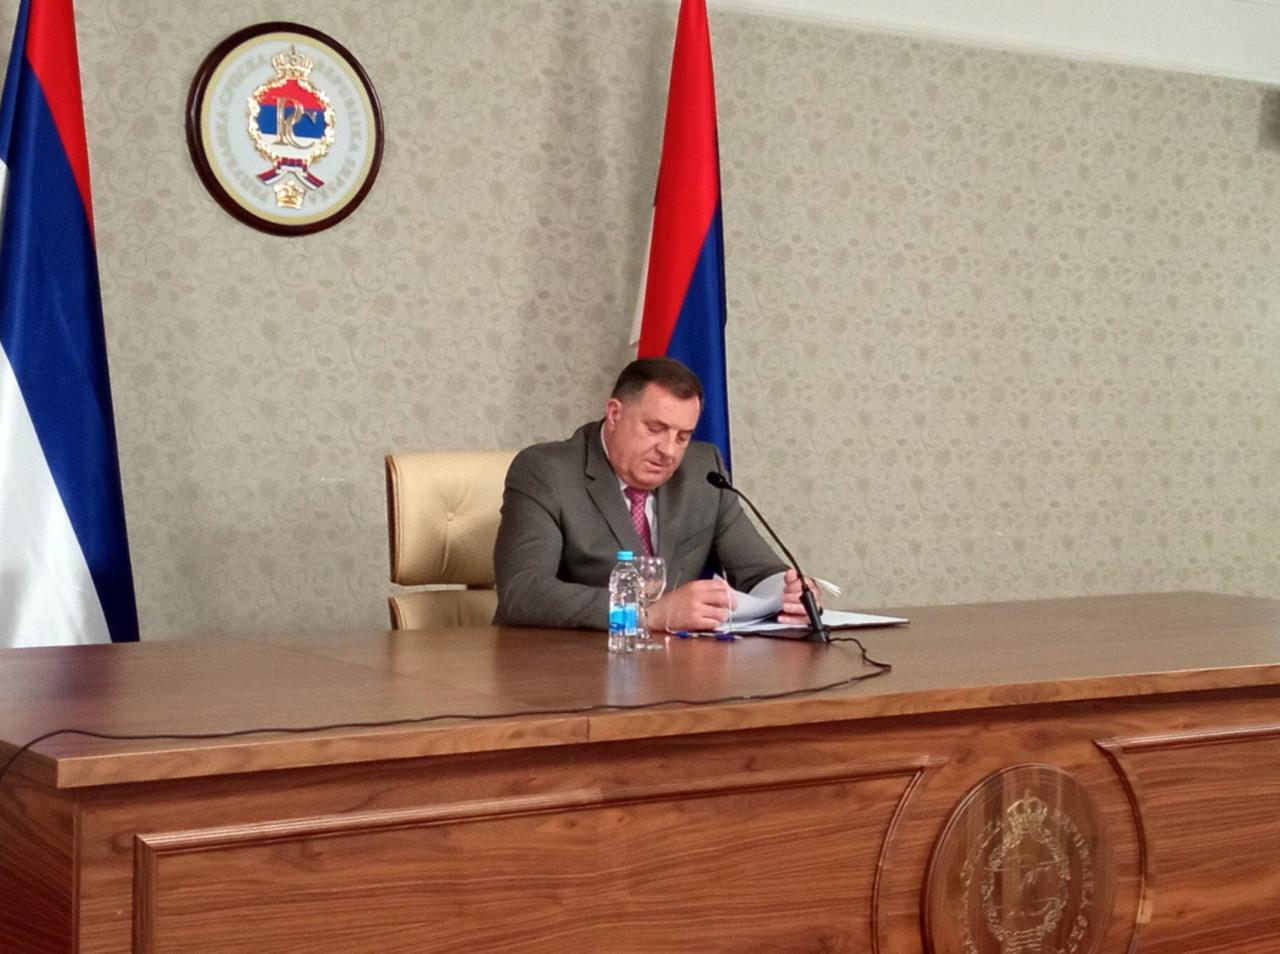 RS's Dodik slams BH ambassador to UN over his speech, calls him 'man of scandal'